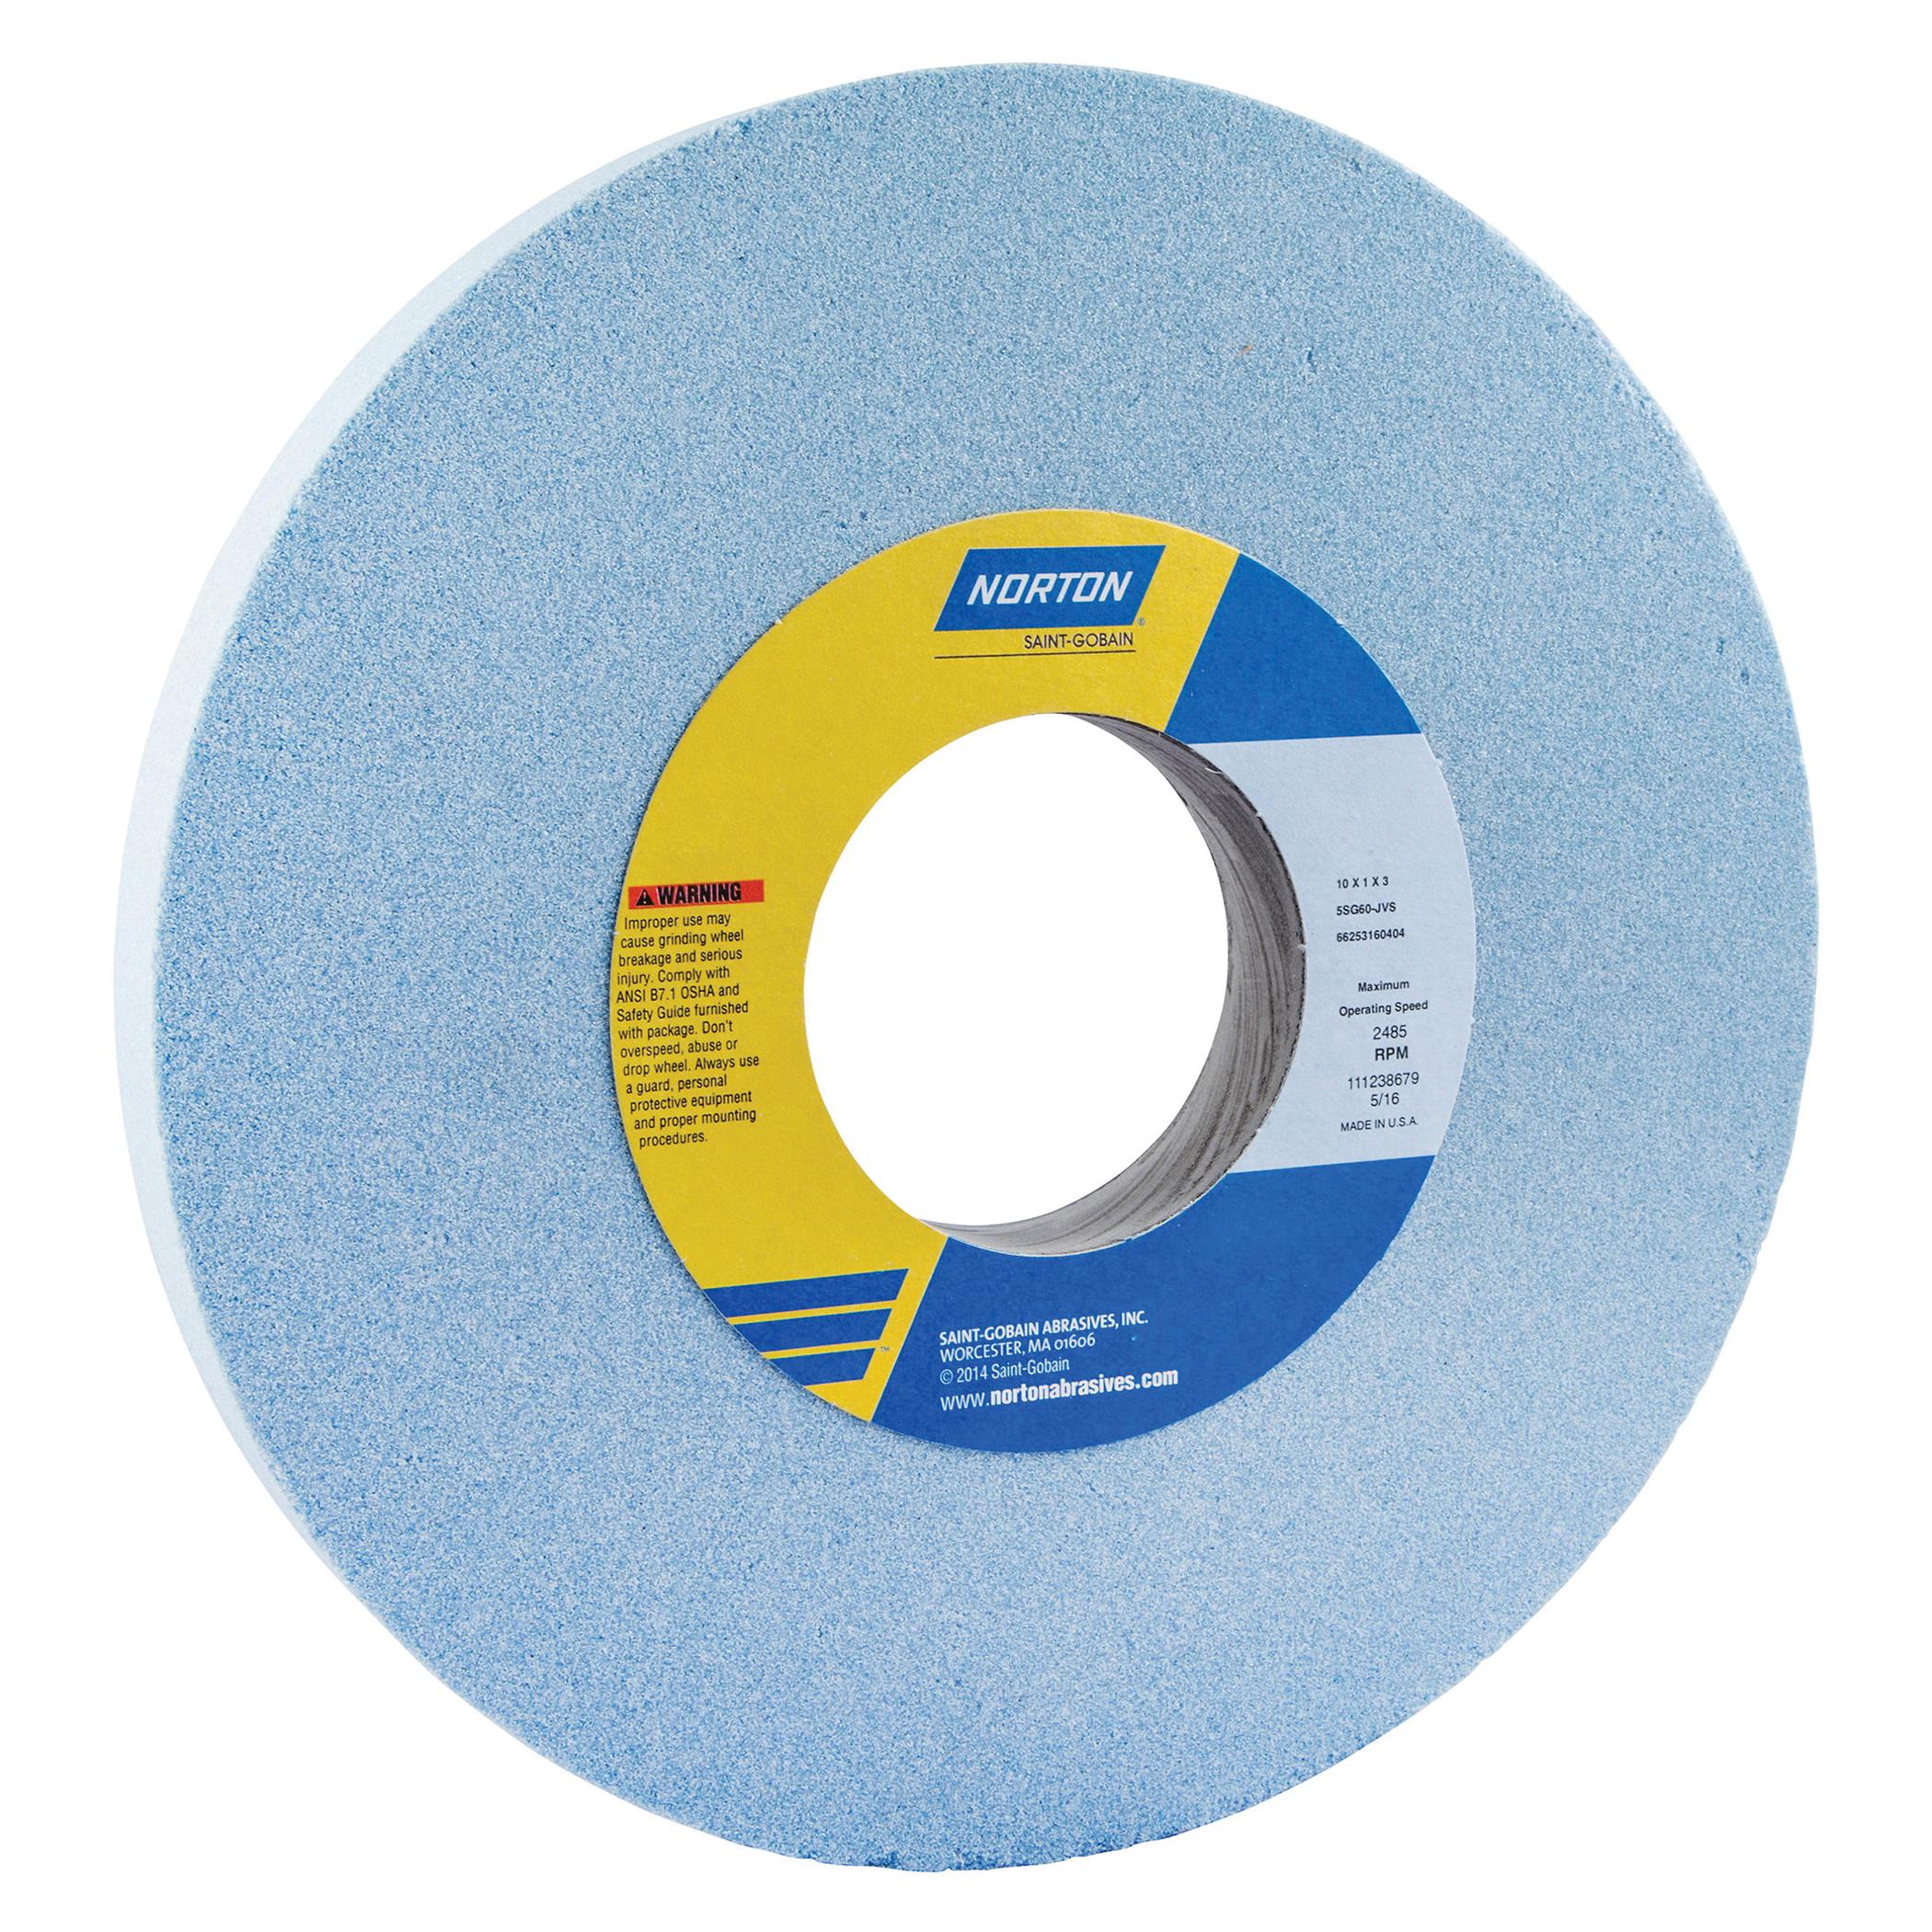 Norton® 66253160404 5SG Straight Toolroom Wheel, 10 in Dia x 1 in THK, 3 in Center Hole, 60 Grit, Ceramic Alumina/Friable Aluminum Oxide Abrasive